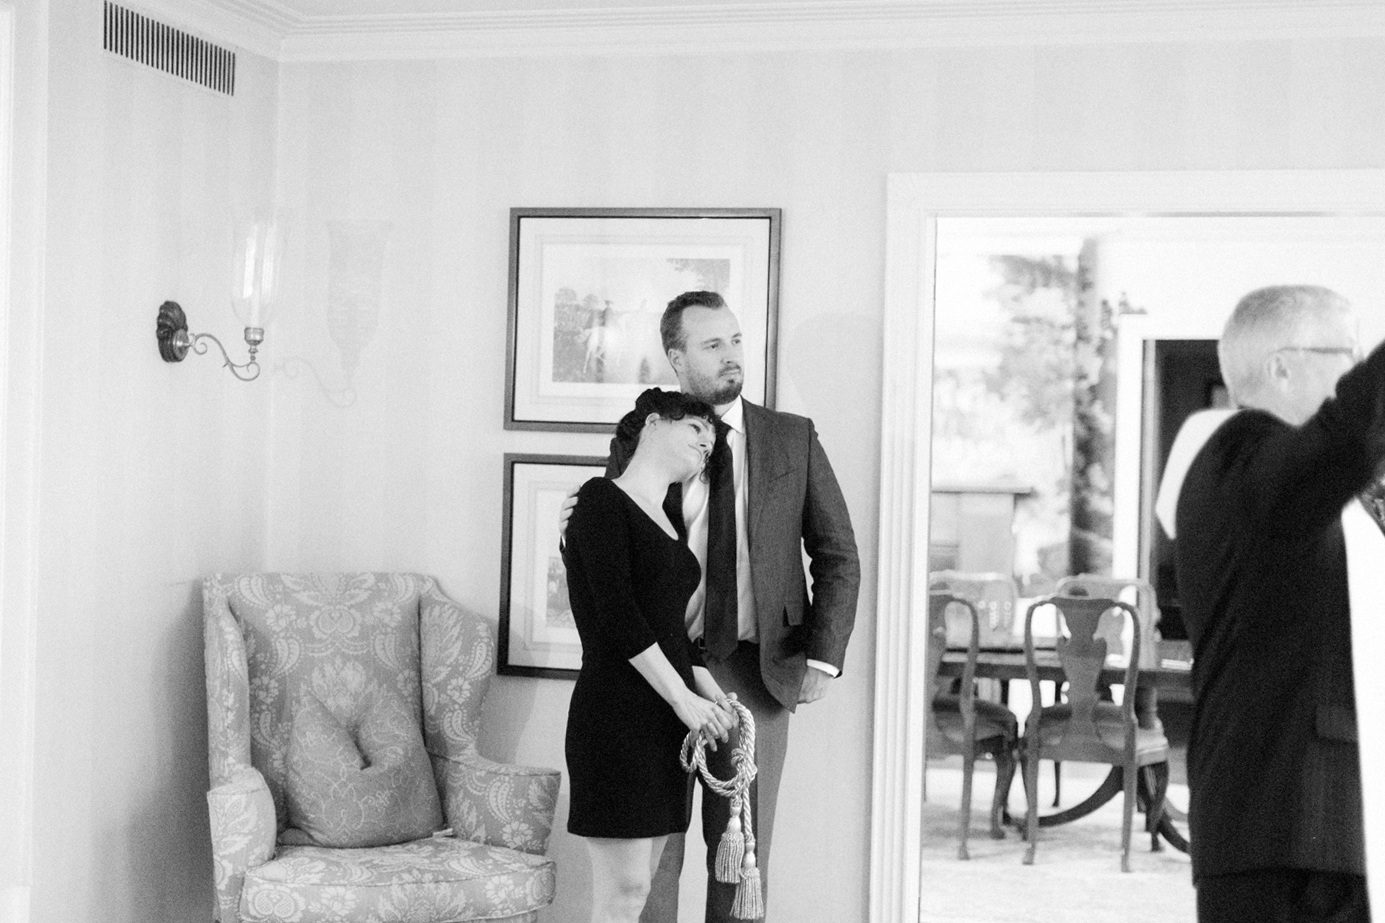 114-rustic-wedding-photography-washington-dc.jpg